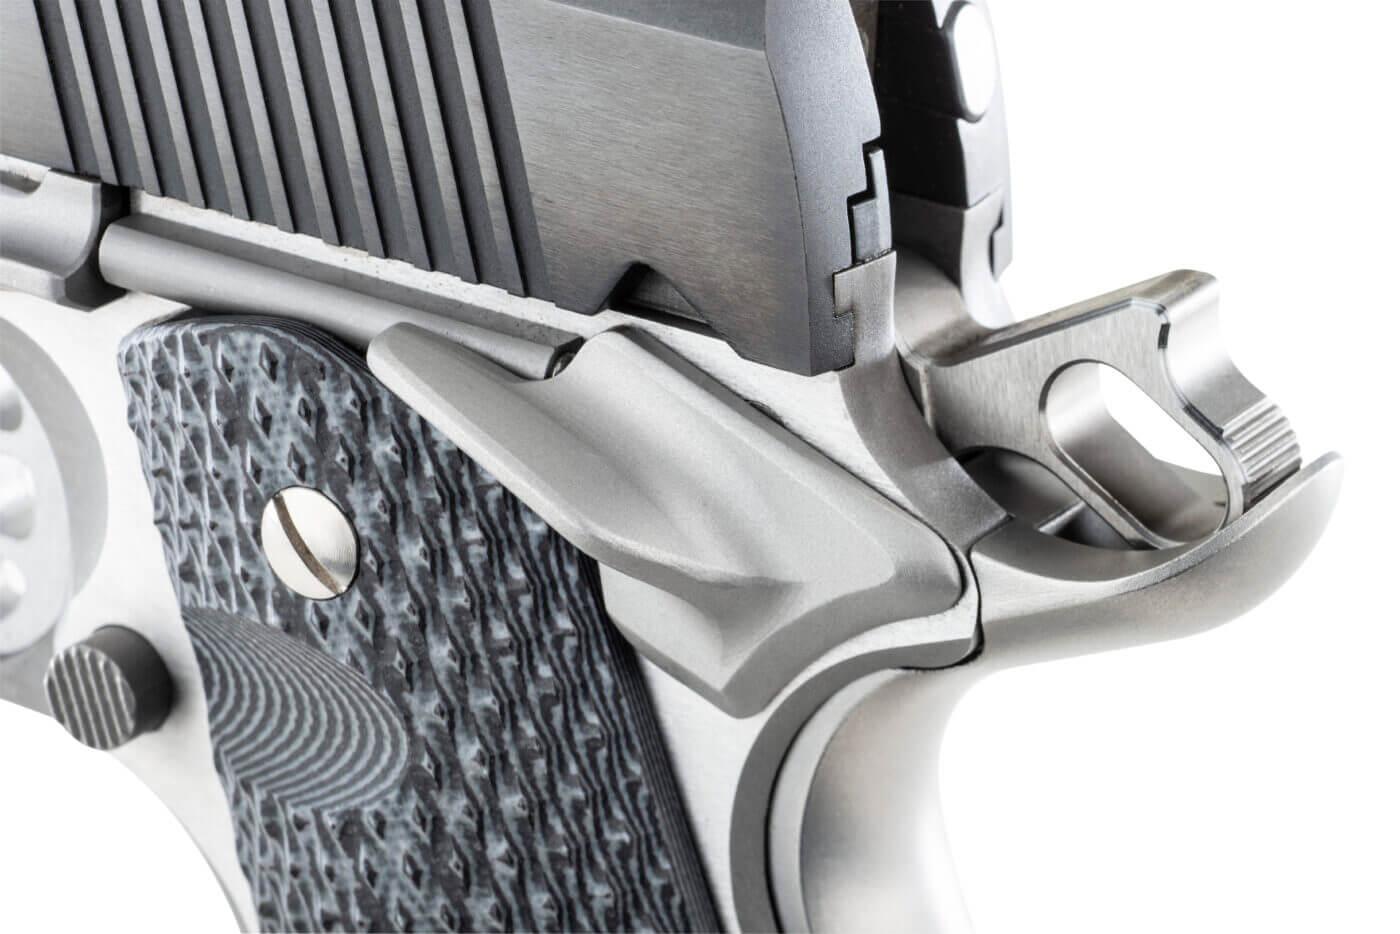 Harrison Custom Extreme Service Thumb Safety on a Ronin 1911 pistol